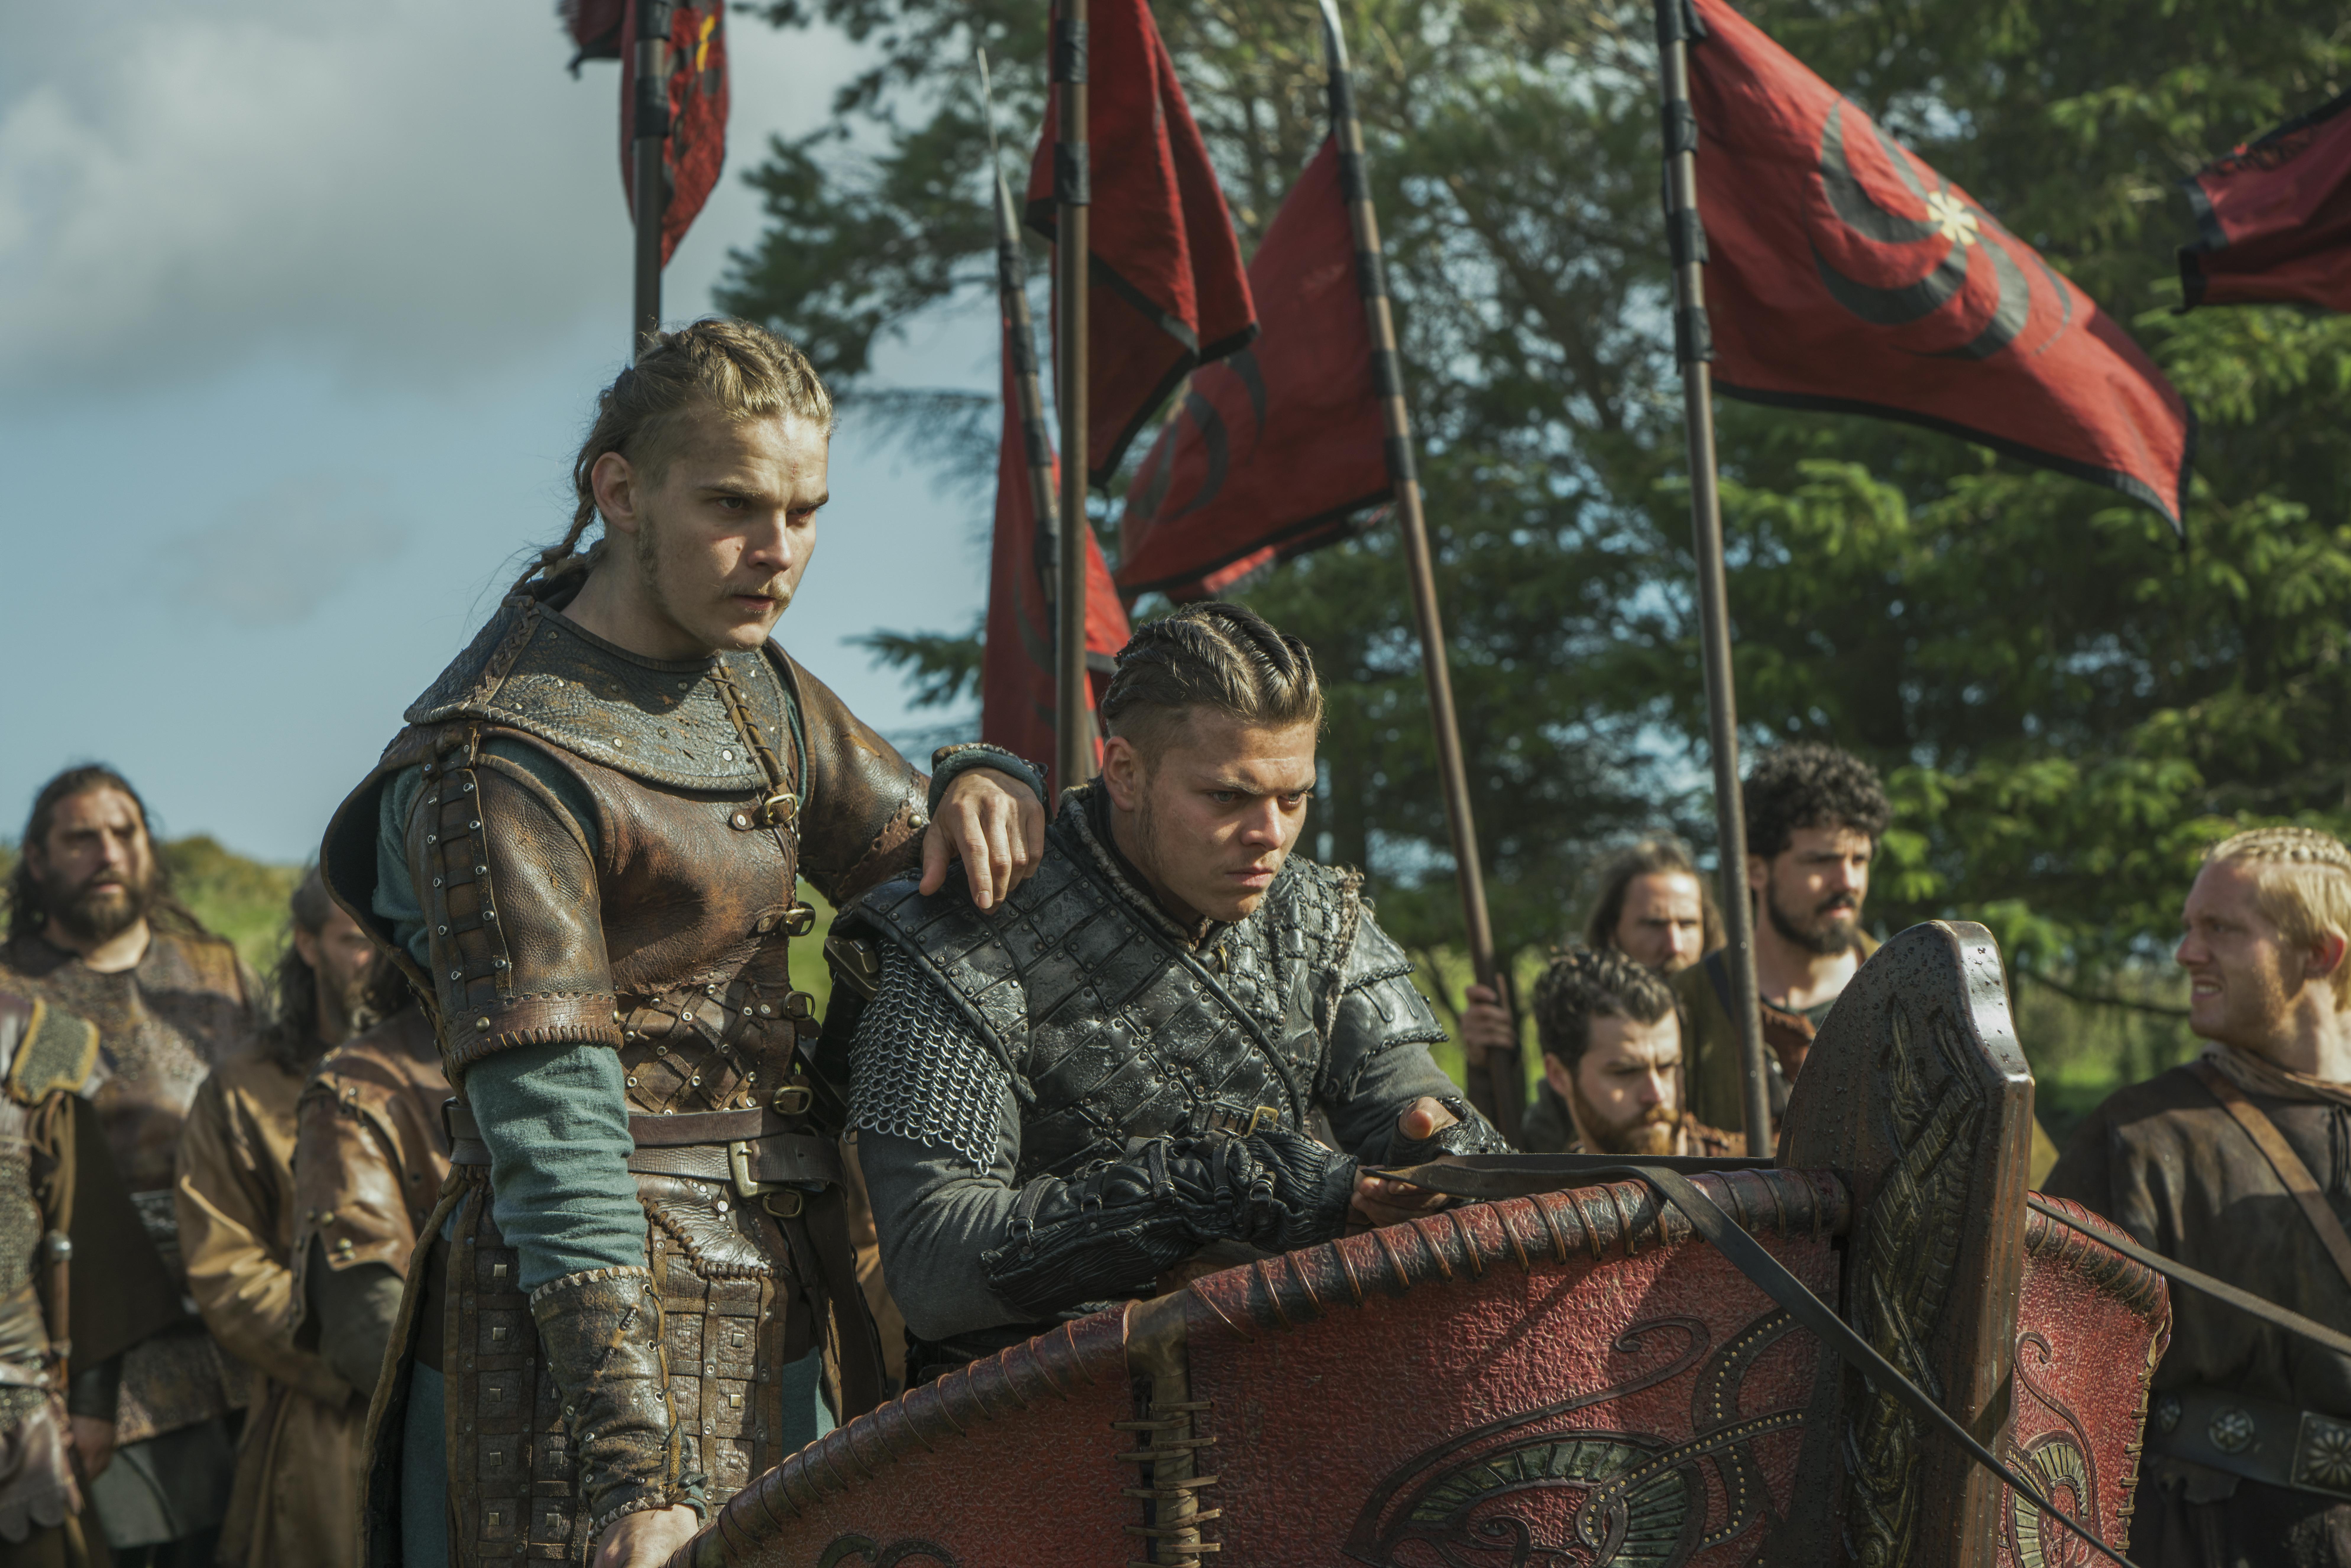 5 WTH moments in History's Vikings Season 5 so far